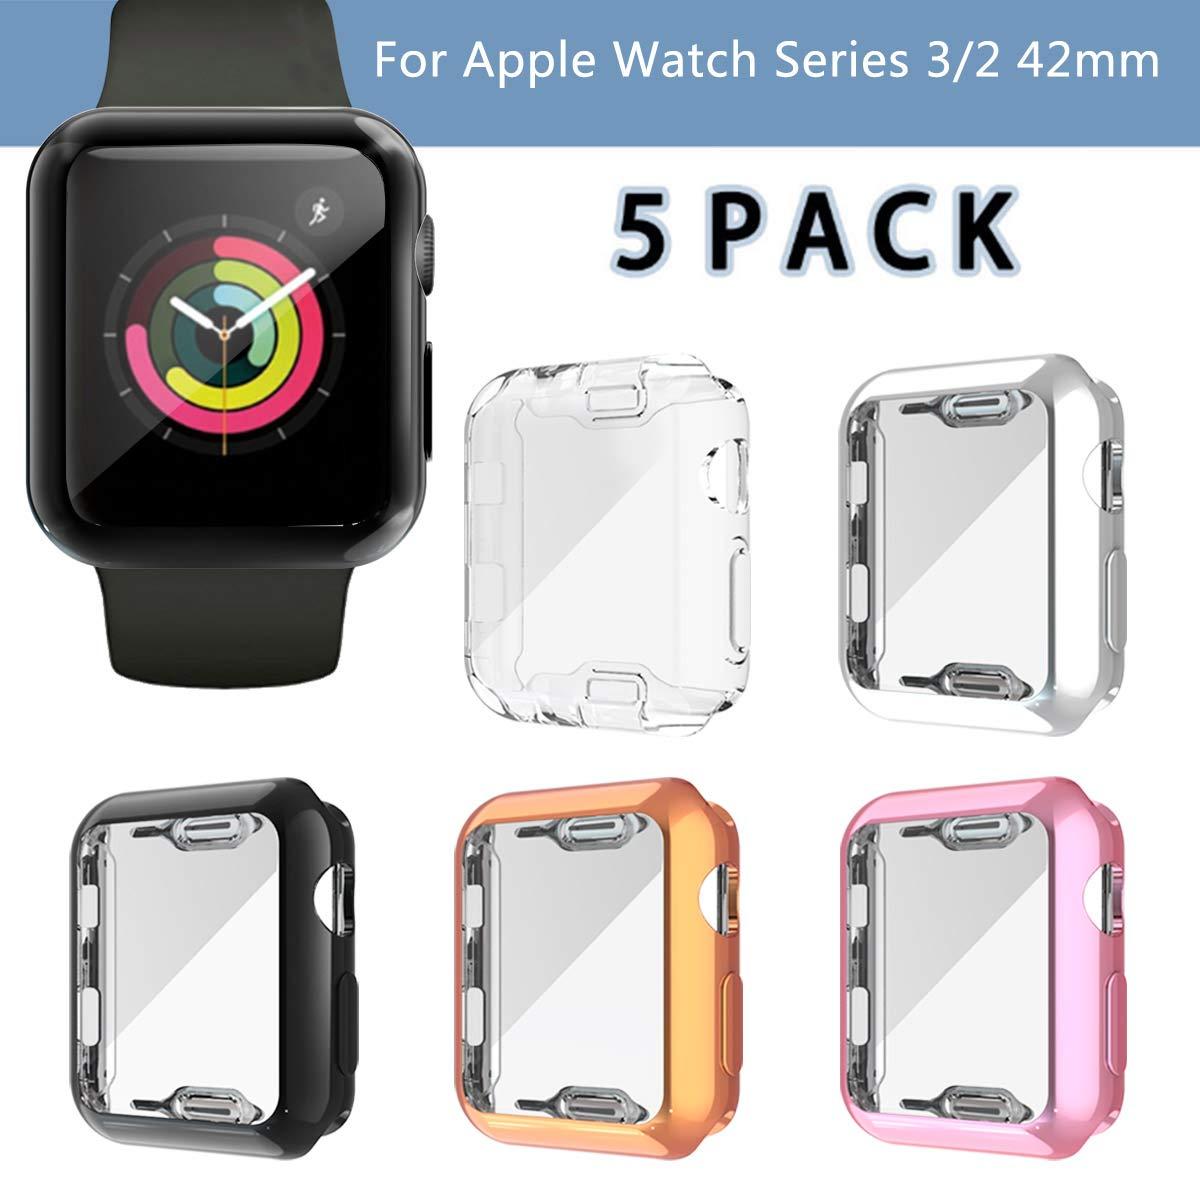 5 Fundas Para Apple Watch Series 3 (42mm) Tpu